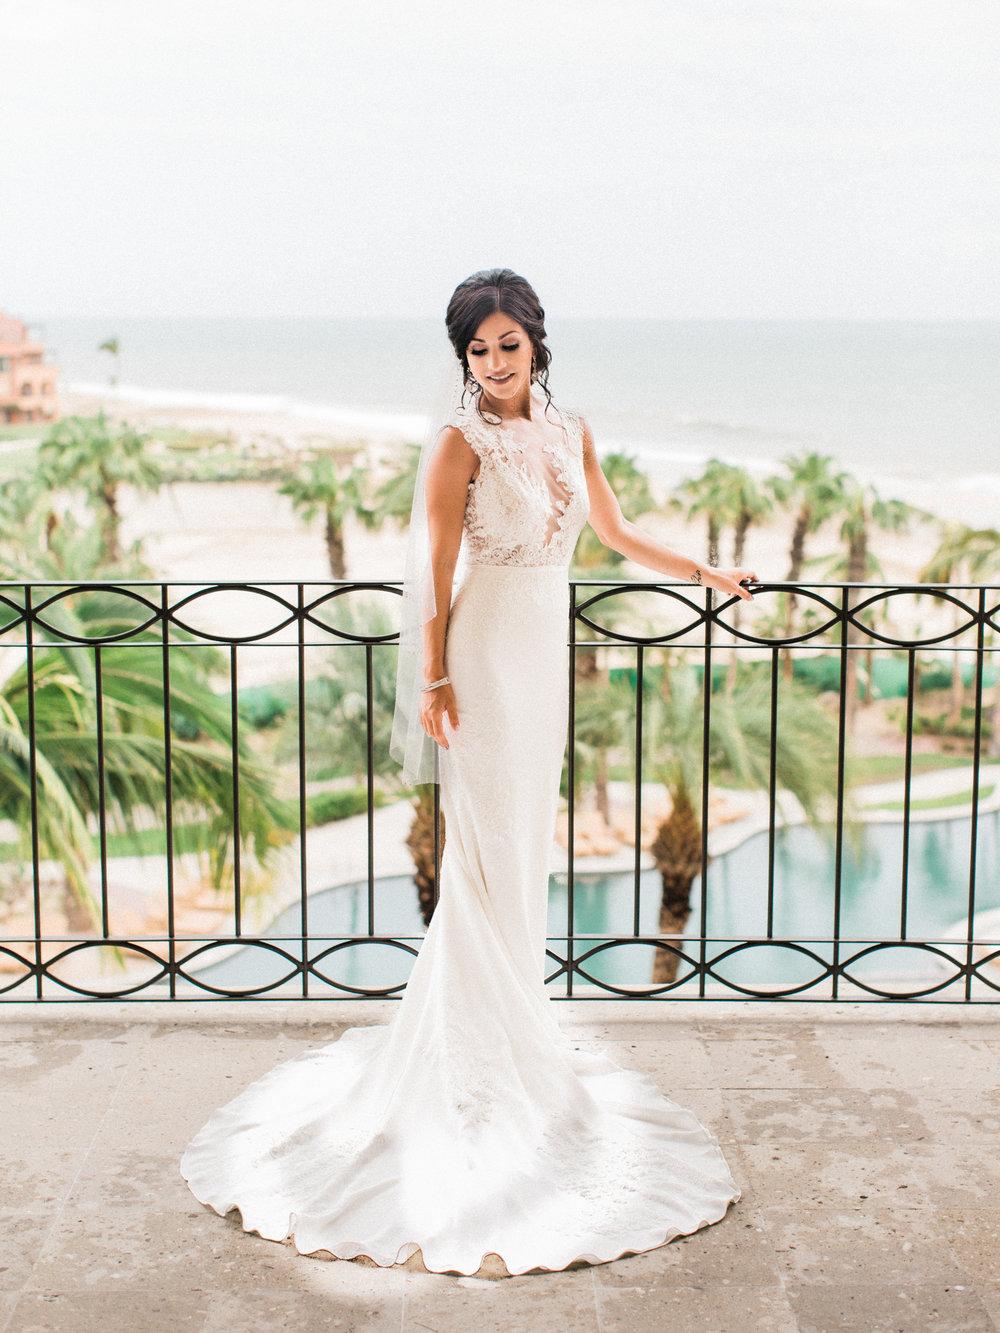 Deanna-and-John-Fahey-Wedding-Los-Cabos-Mexico-Brandon-J-Ferlin-Photography-83.jpg